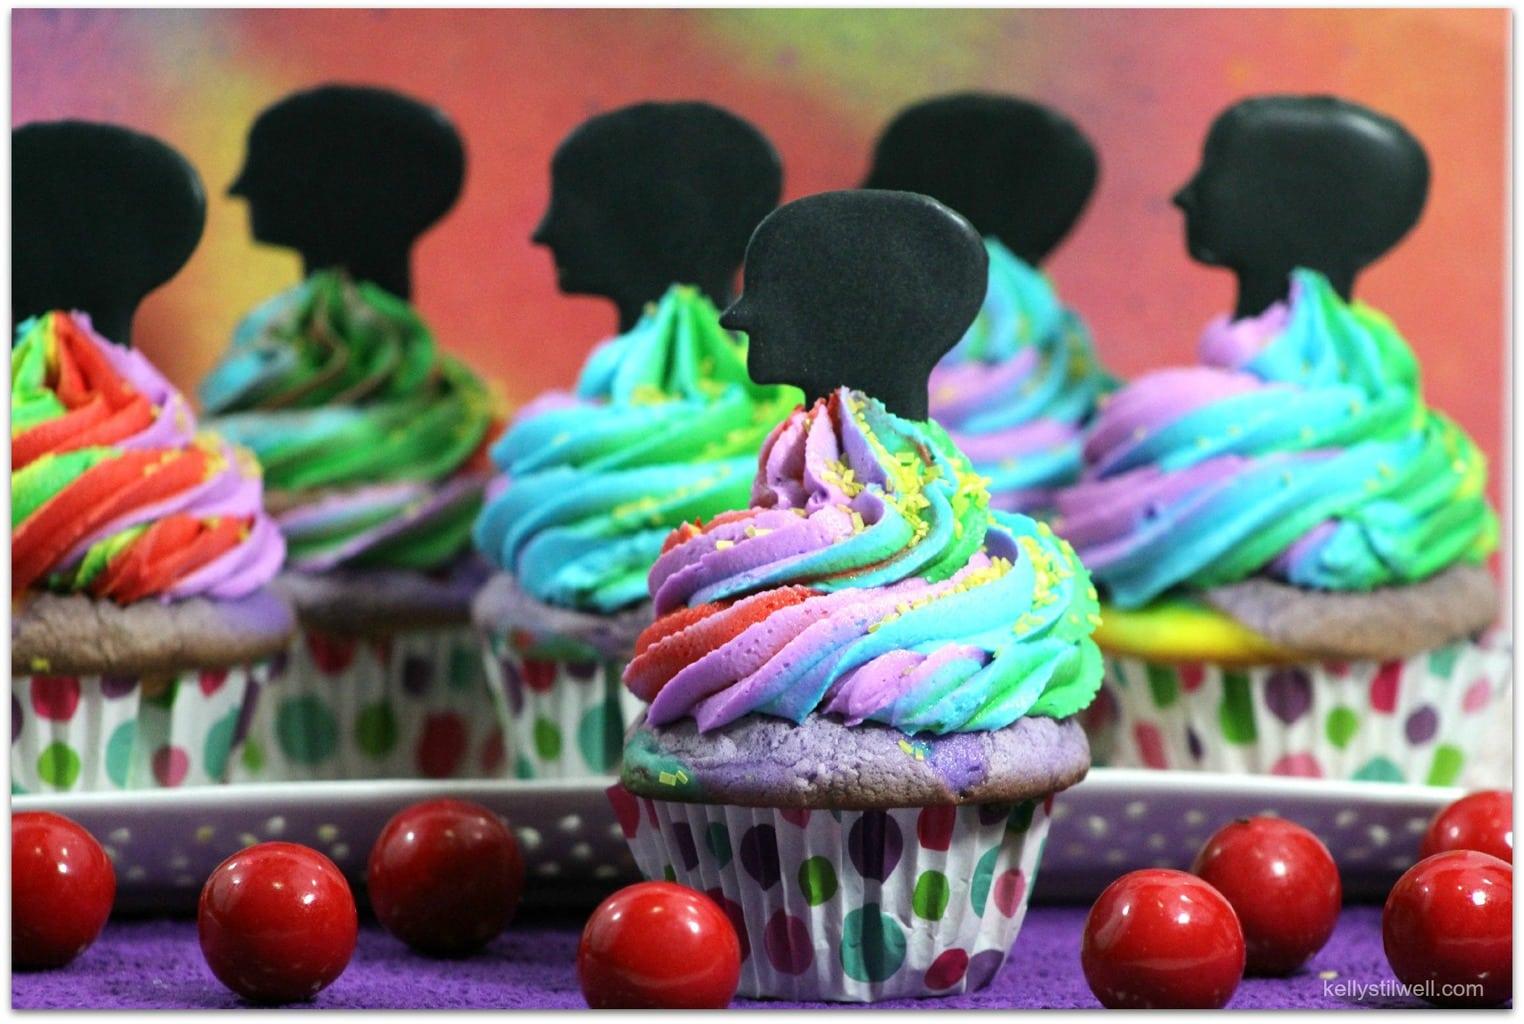 Disney Pixar Inside Out Cupcakes! - Food Fun & Faraway Places